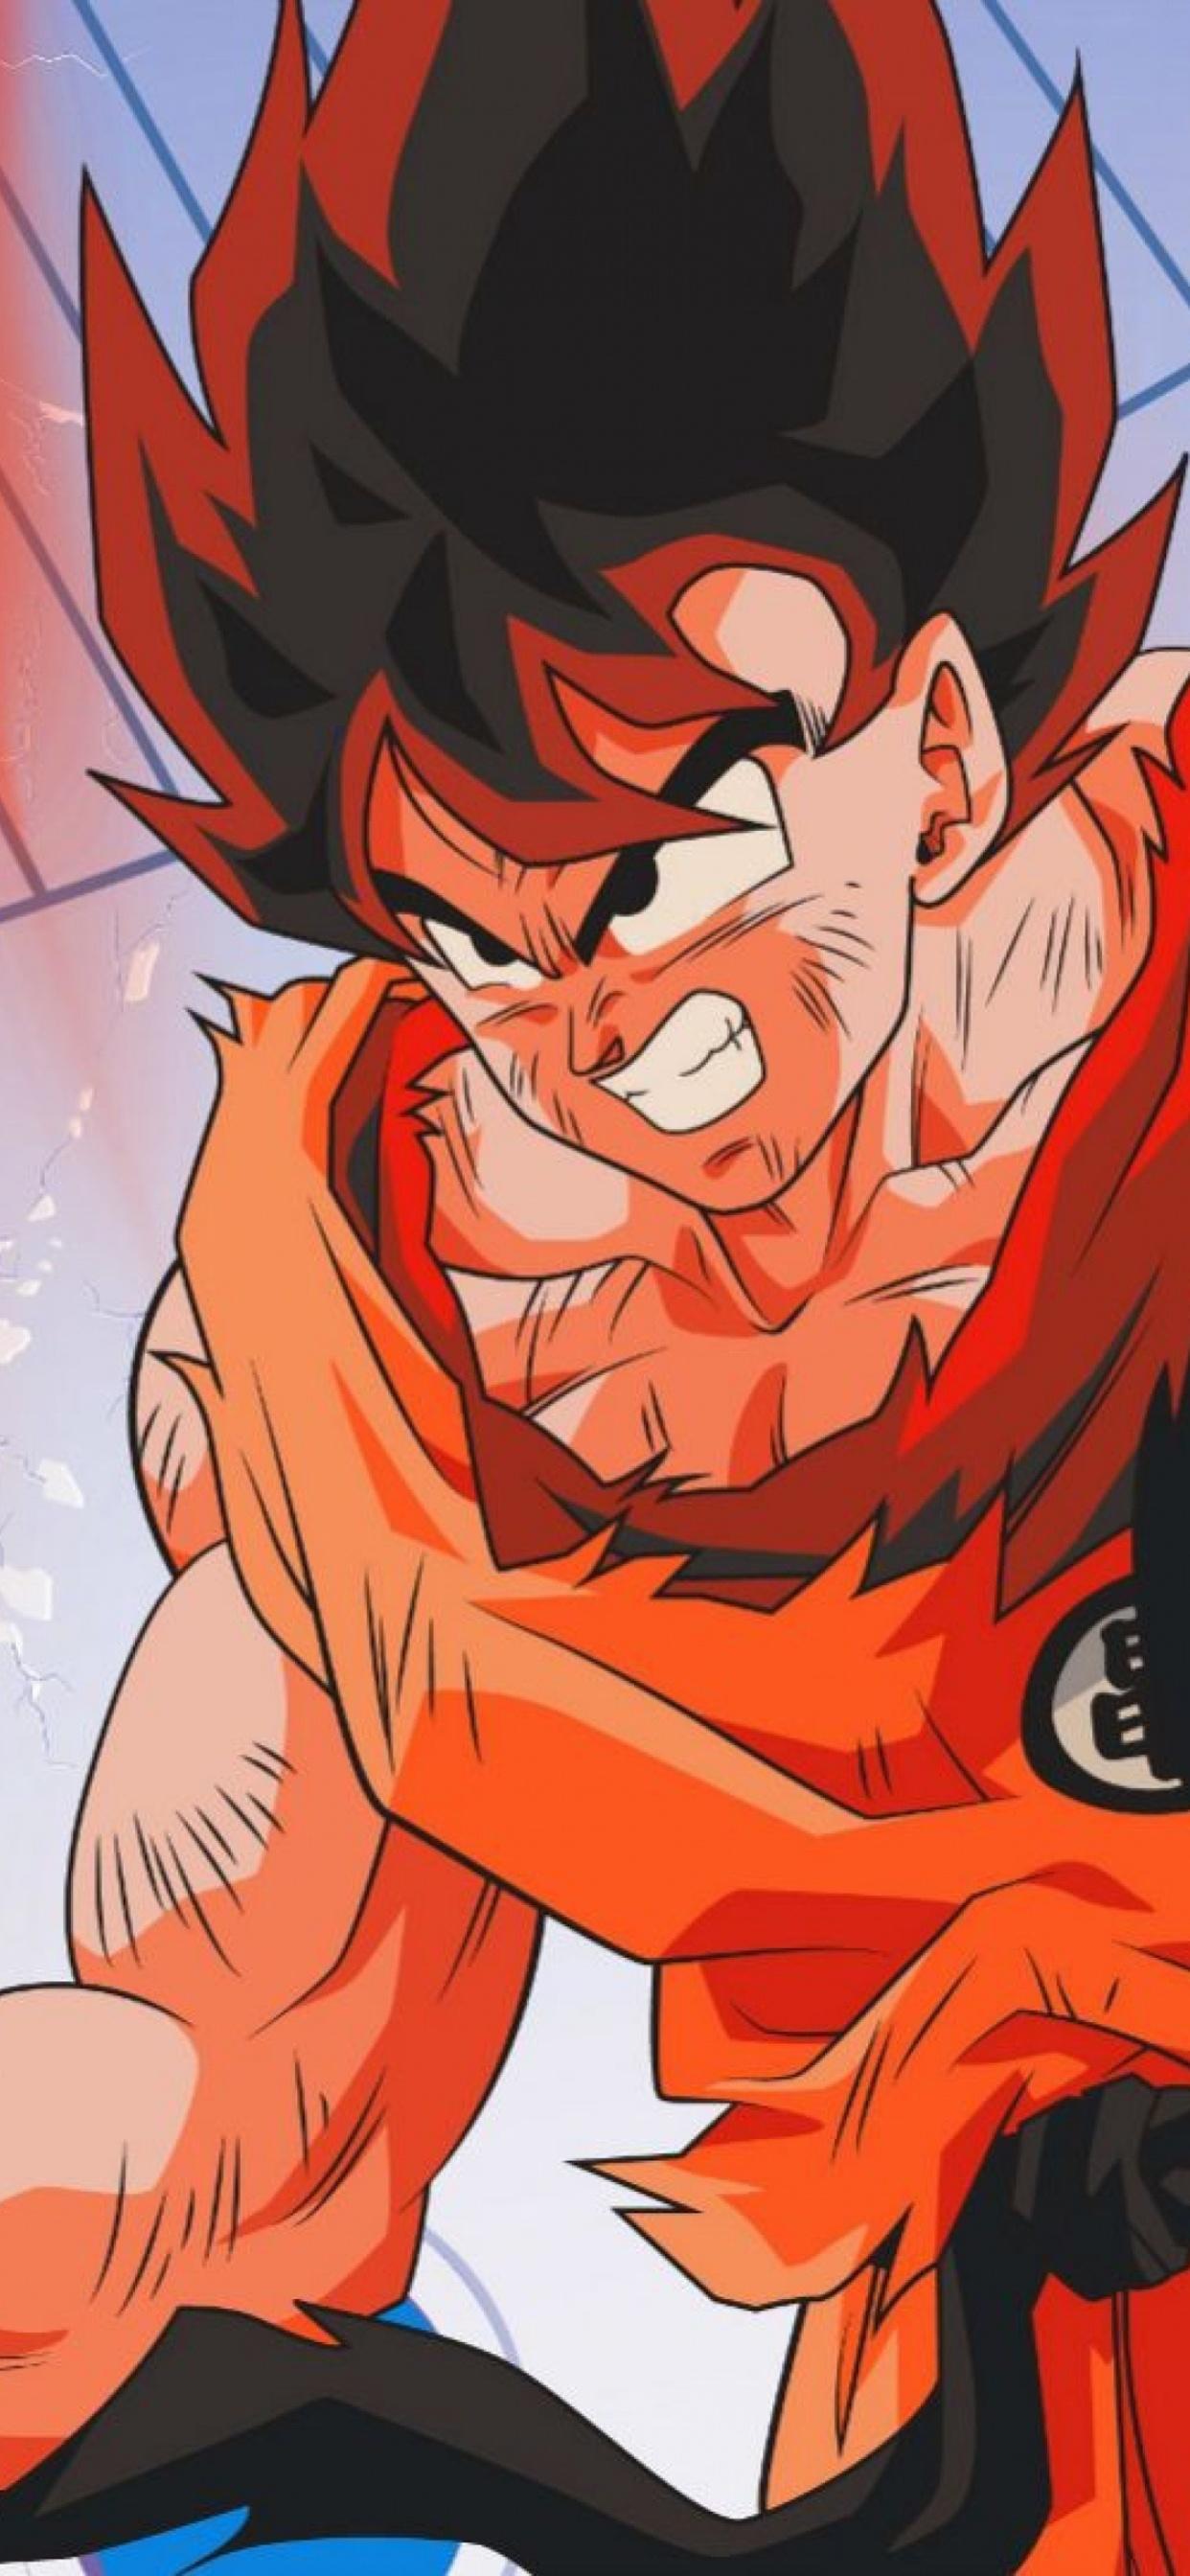 1242x2688 Goku Dragon Ball Z 4k Iphone Xs Max Hd 4k